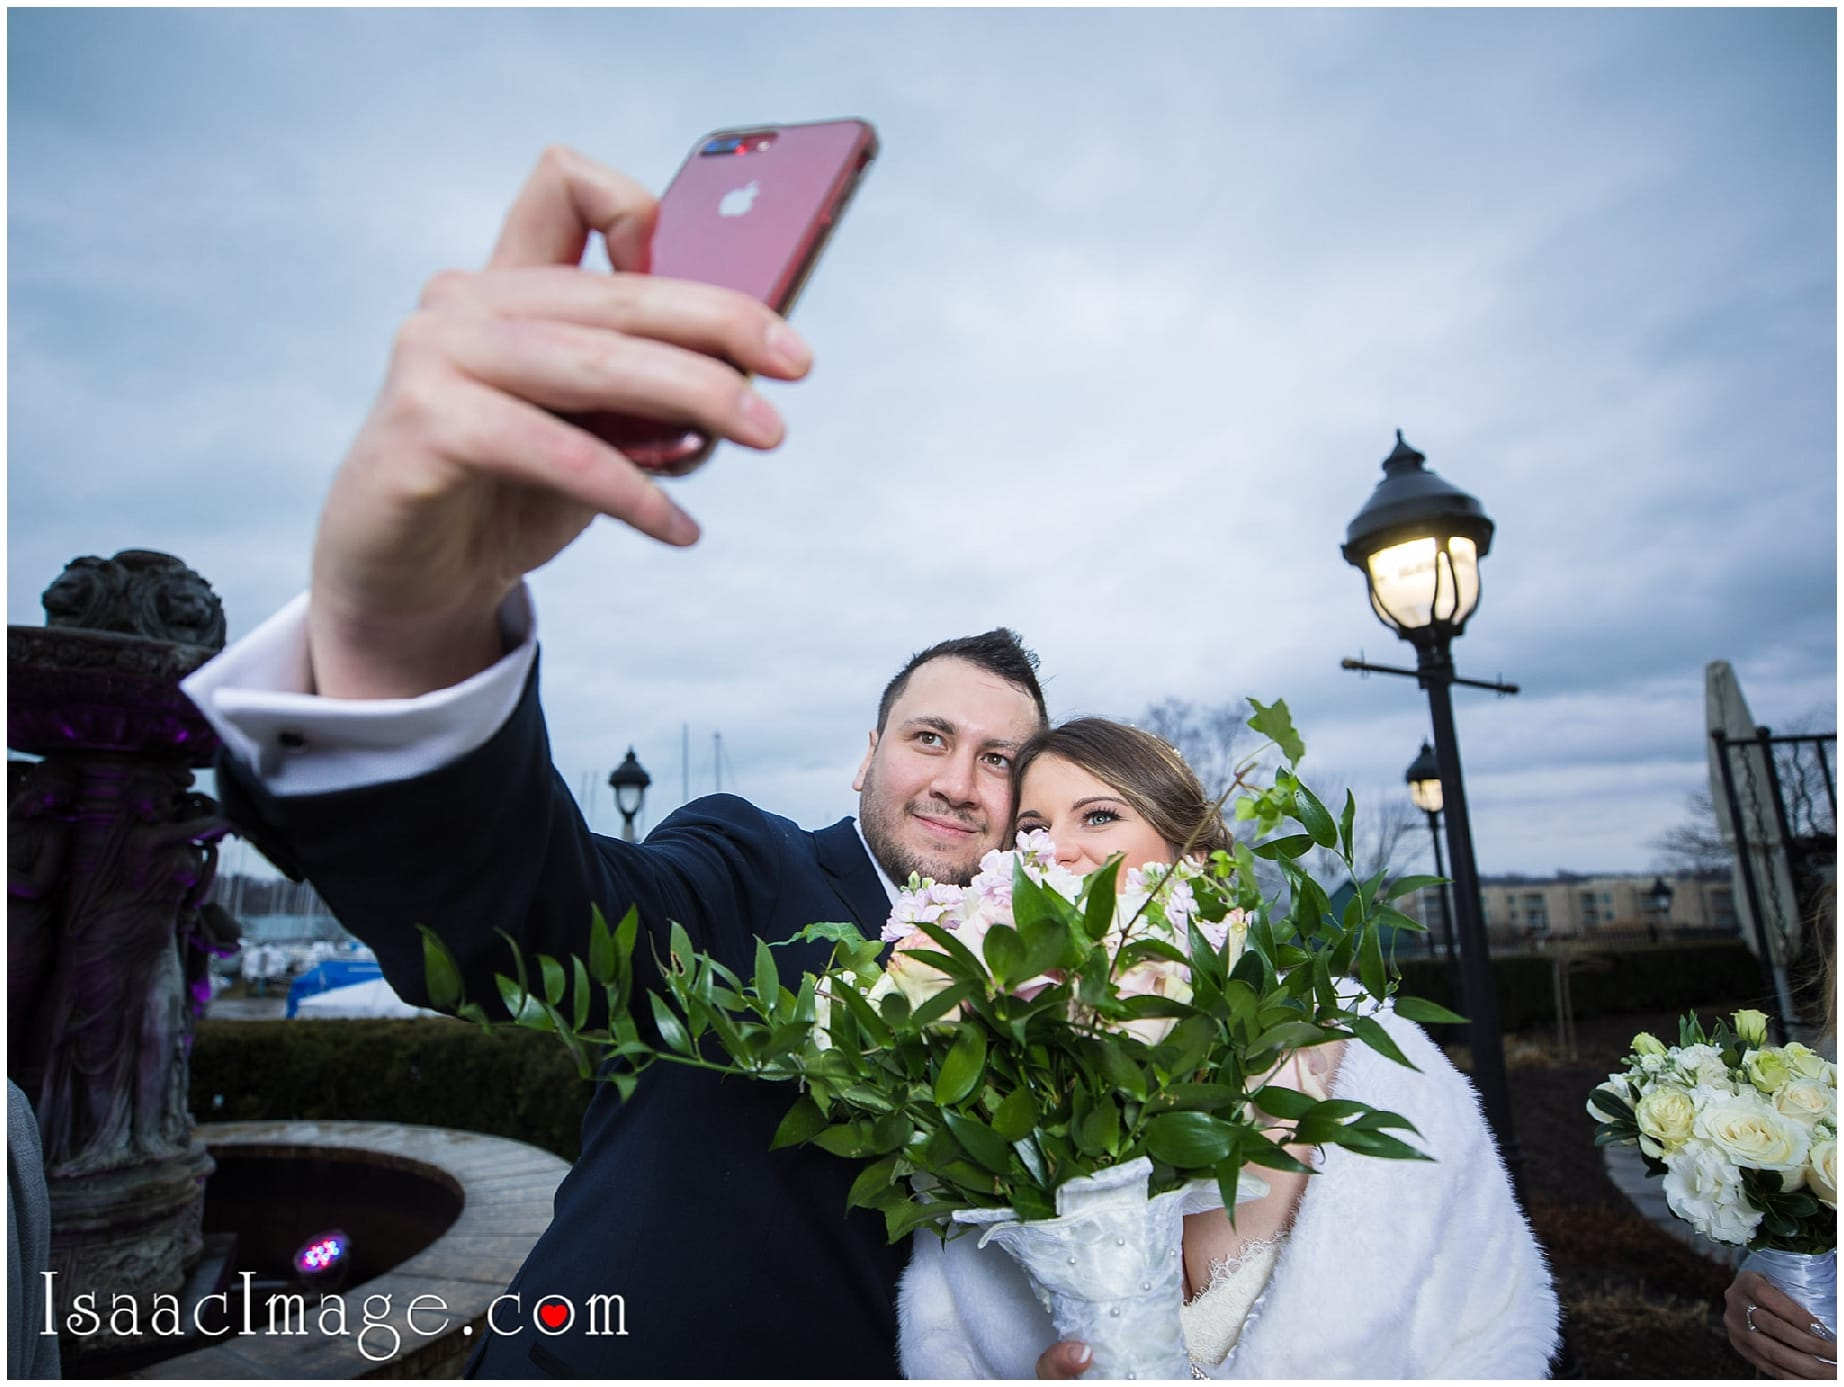 Queens Landing Hotel Wedding Niagara On The Lake Ian and Sasha_0796.jpg